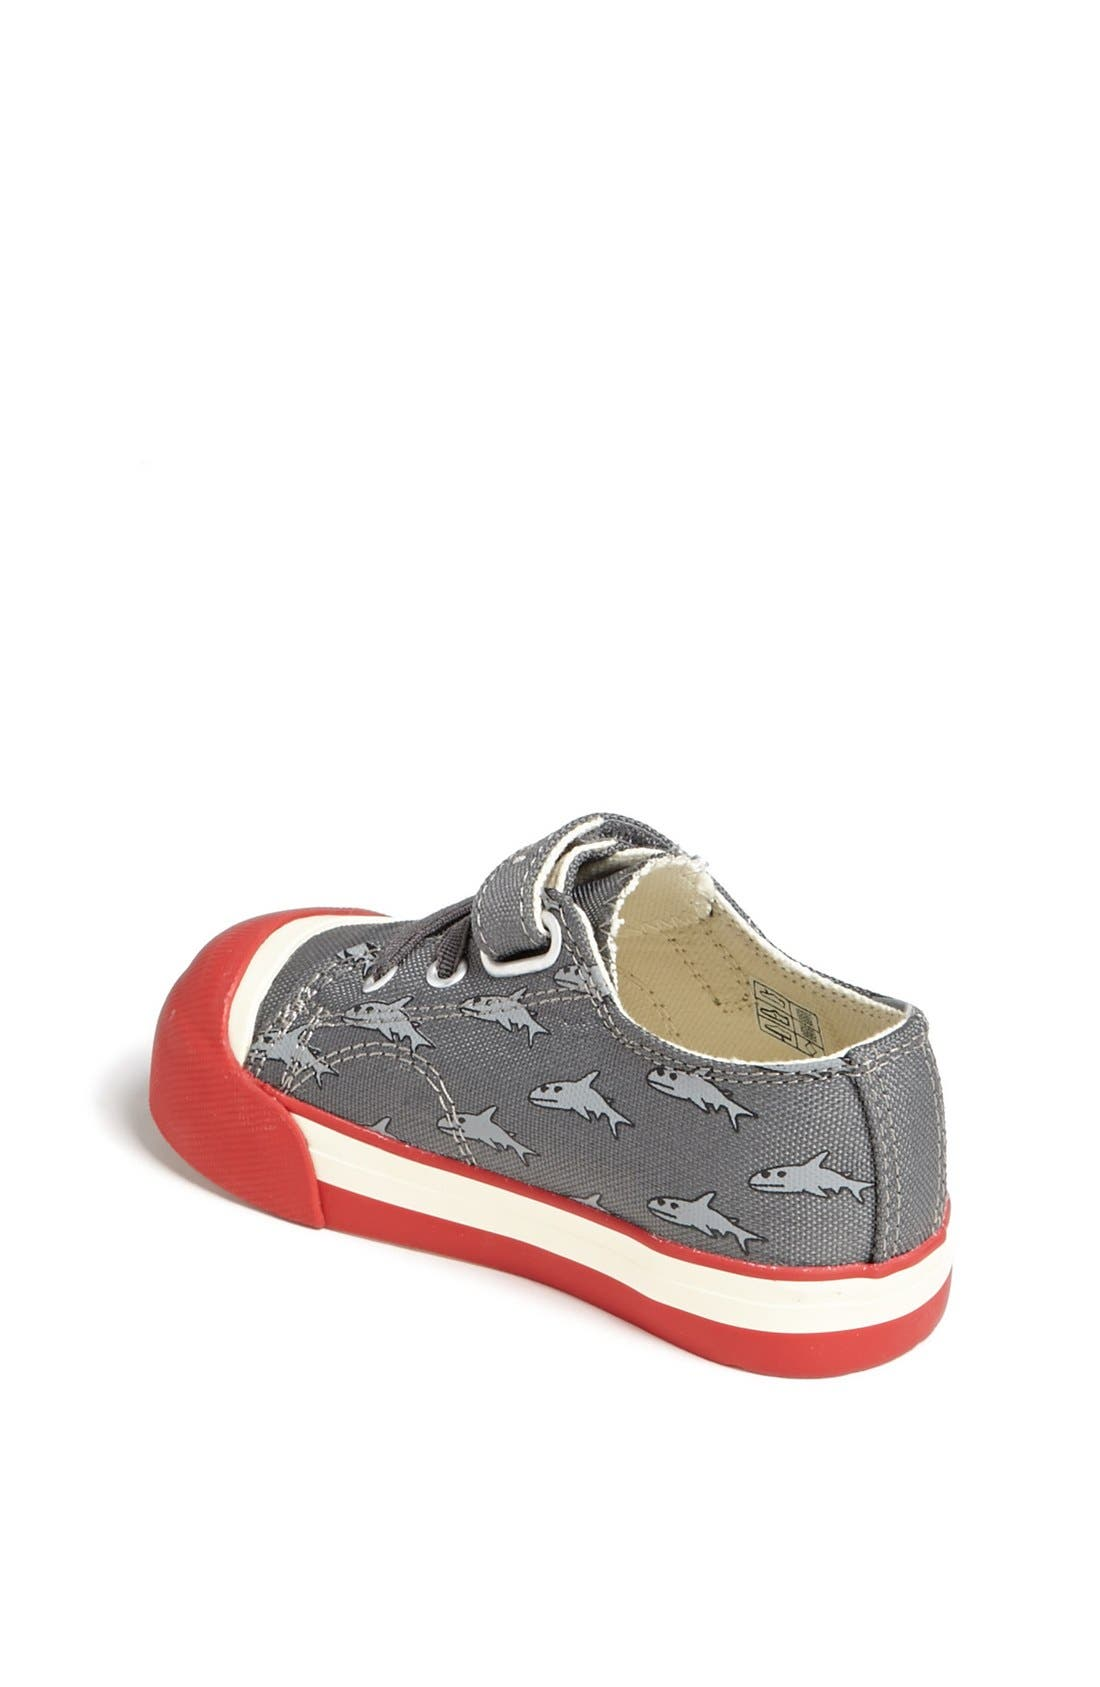 Alternate Image 2  - Keen 'Coronado' Print Sneaker (Baby, Walker, Toddler, Little Kids)